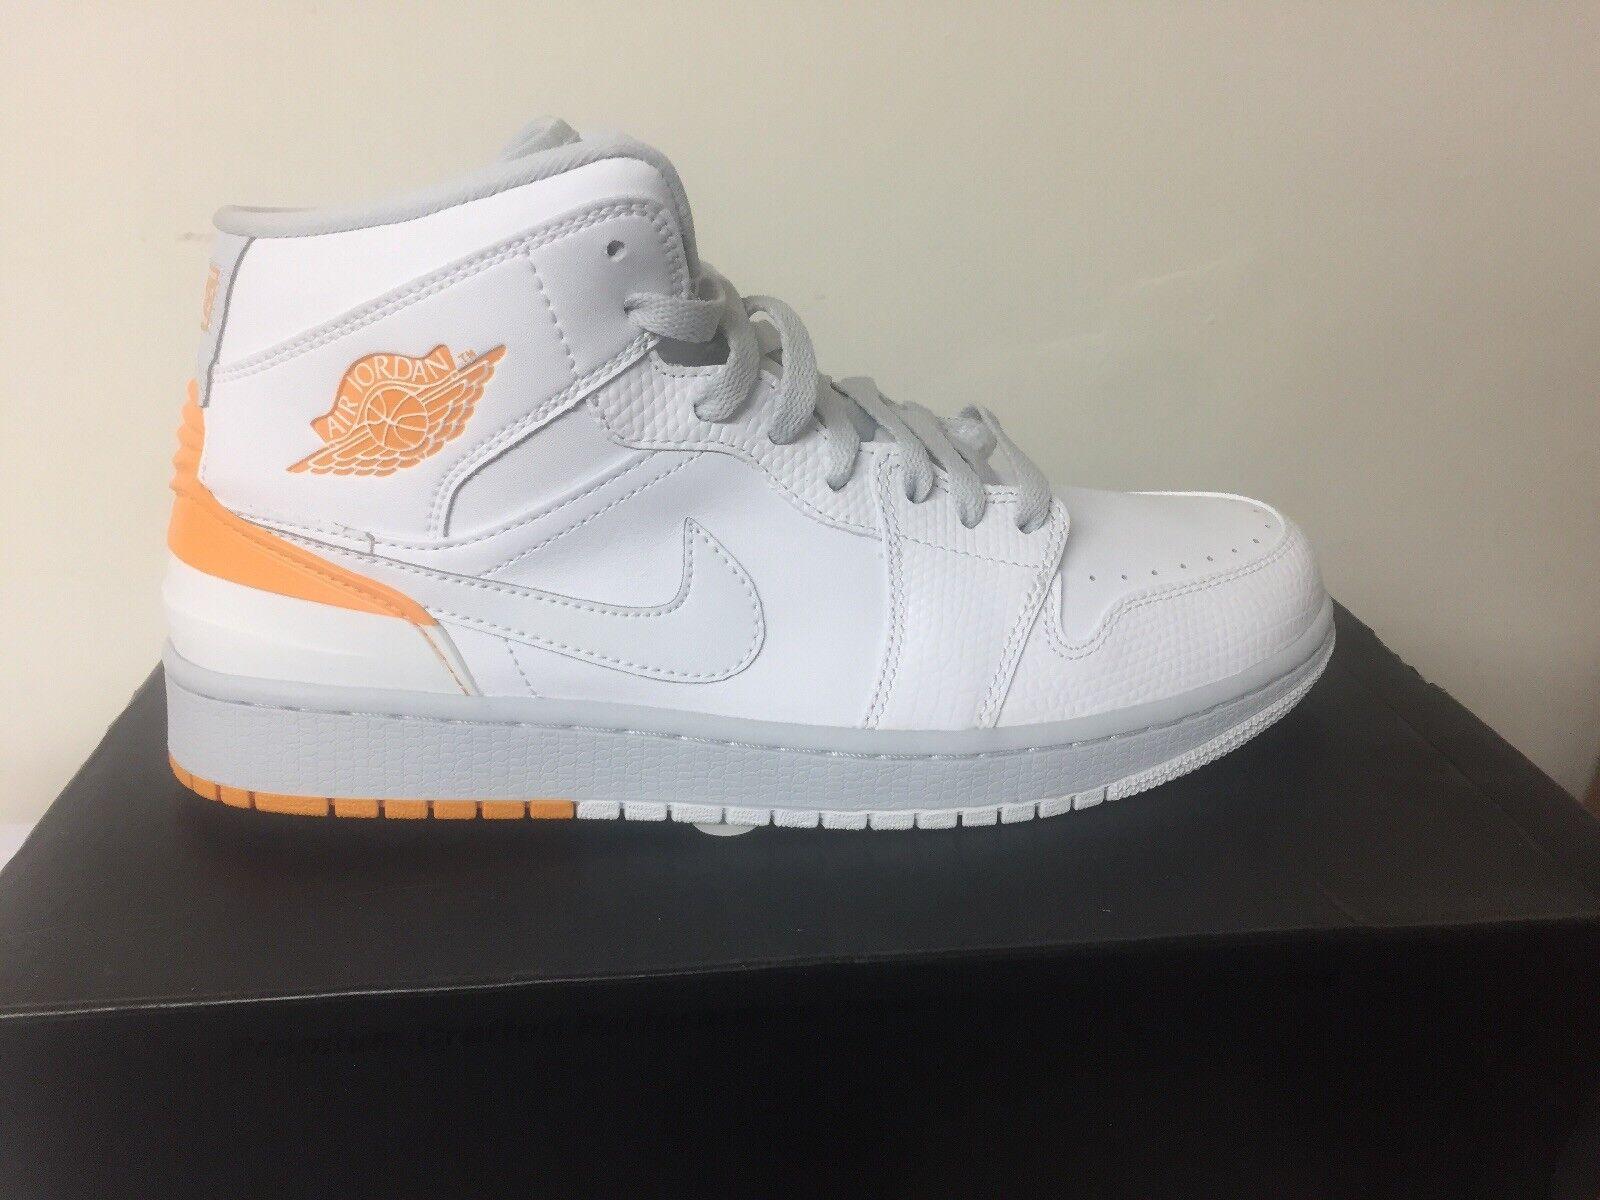 Nike '86, Air Jordan 1 retro '86, Nike blancos, hombres es comodo 26fc05